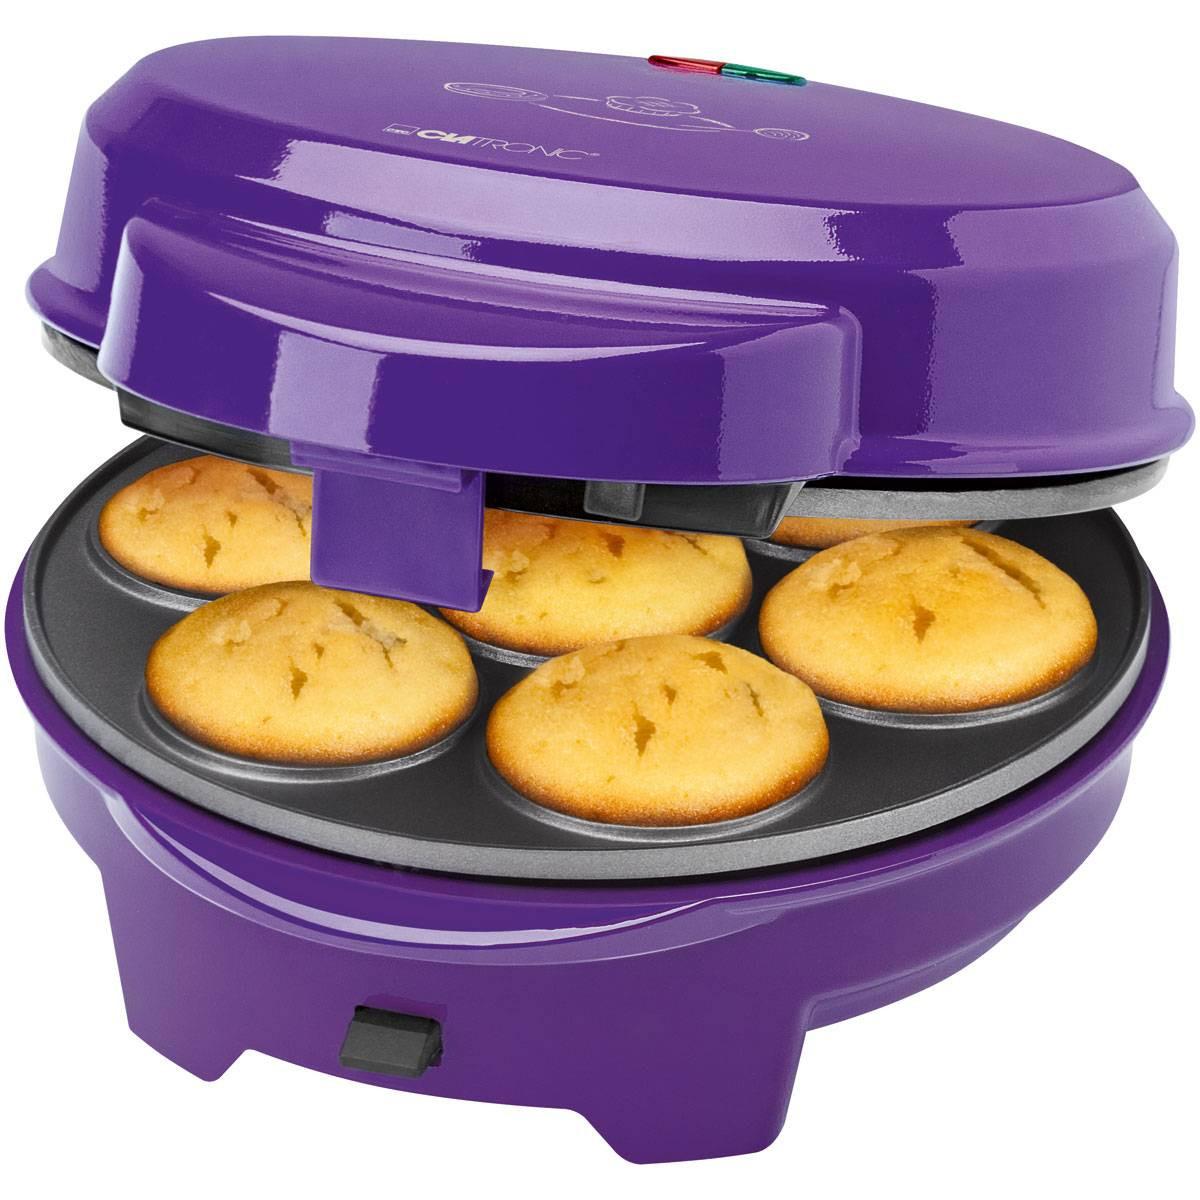 Clatronic Máquina de hacer Donuts Muffin y Pop Cacke DMC 3533